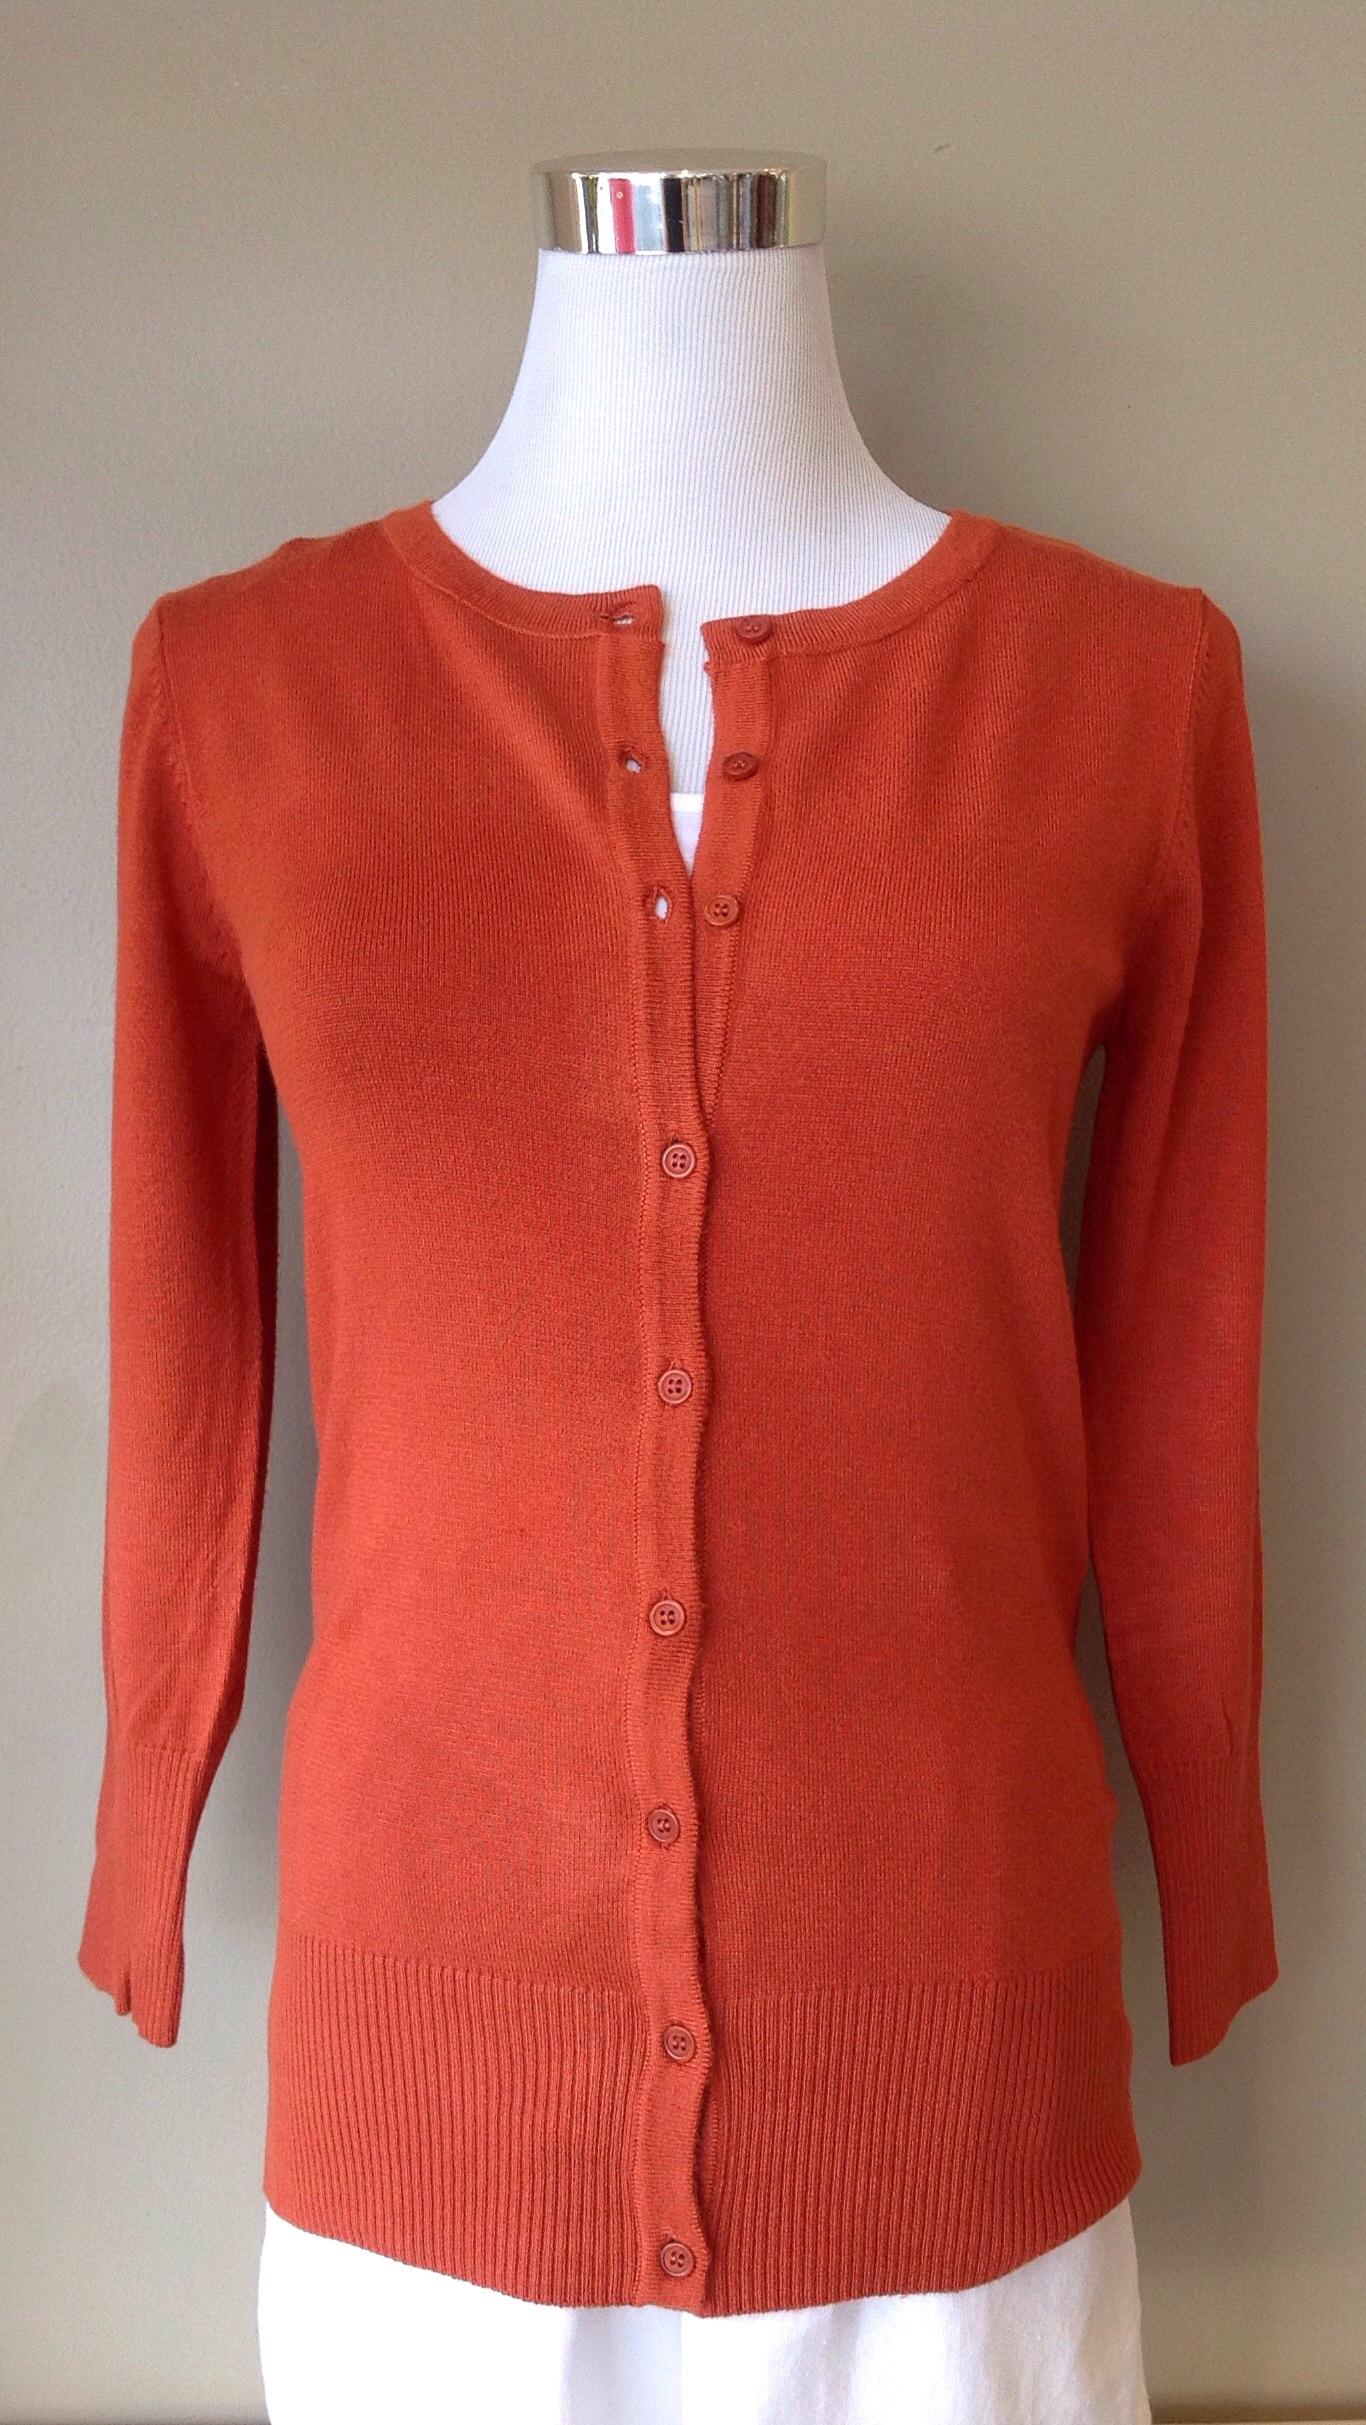 Cotton blend 3/4 sleeve cardigan in orange, $28